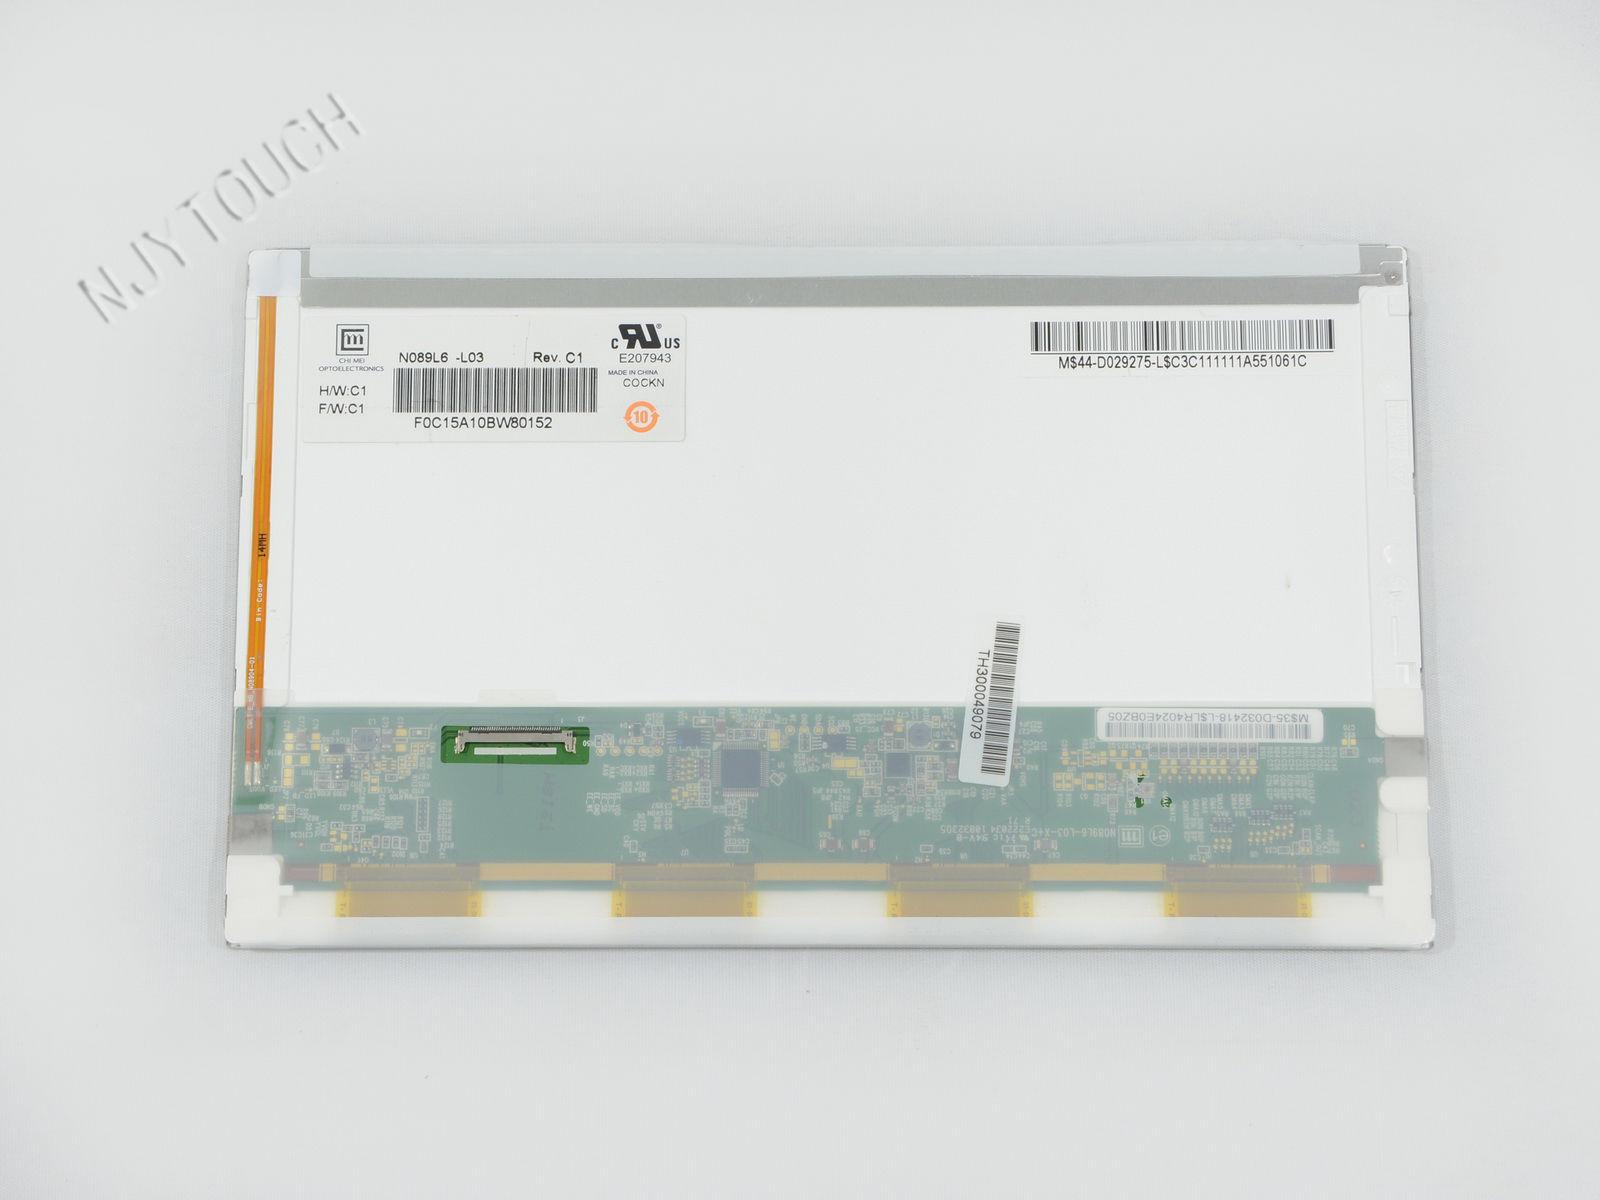 HDMI+DVI+VGA+Audio Controller Board with 8.9inch LCD Display N089L6-L03 1024x600